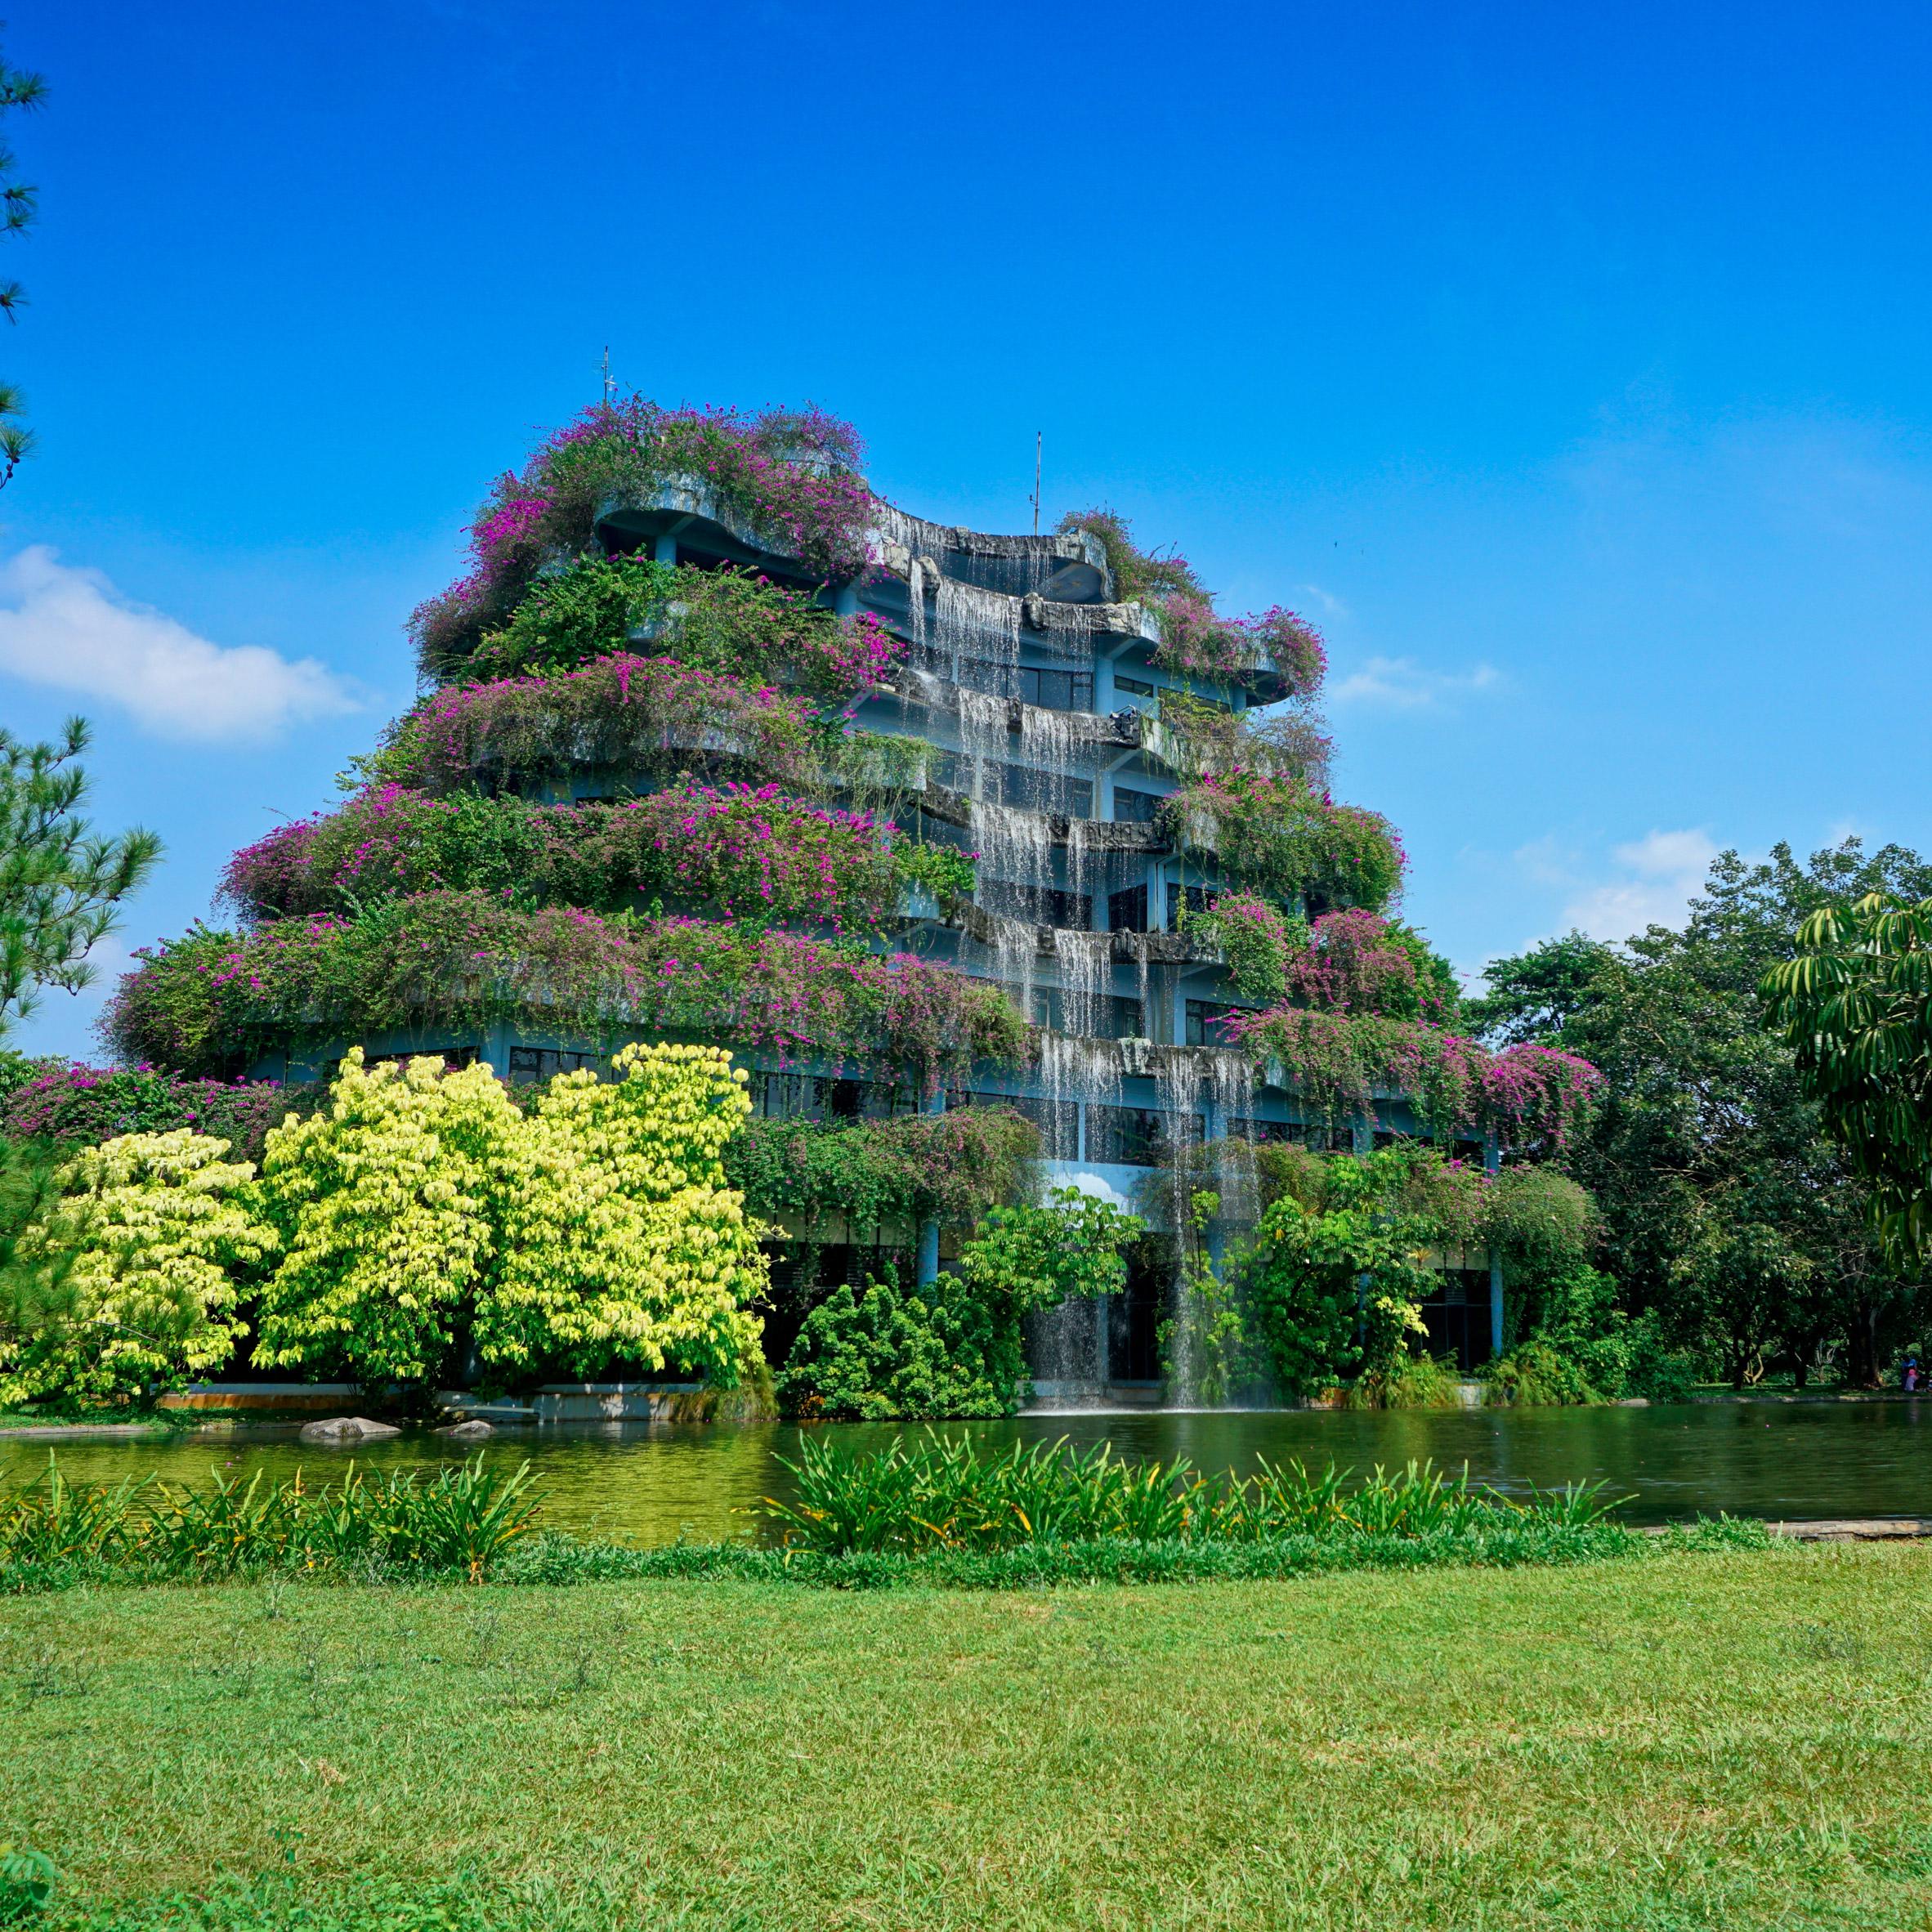 Waterfall architecture: Waterfall building